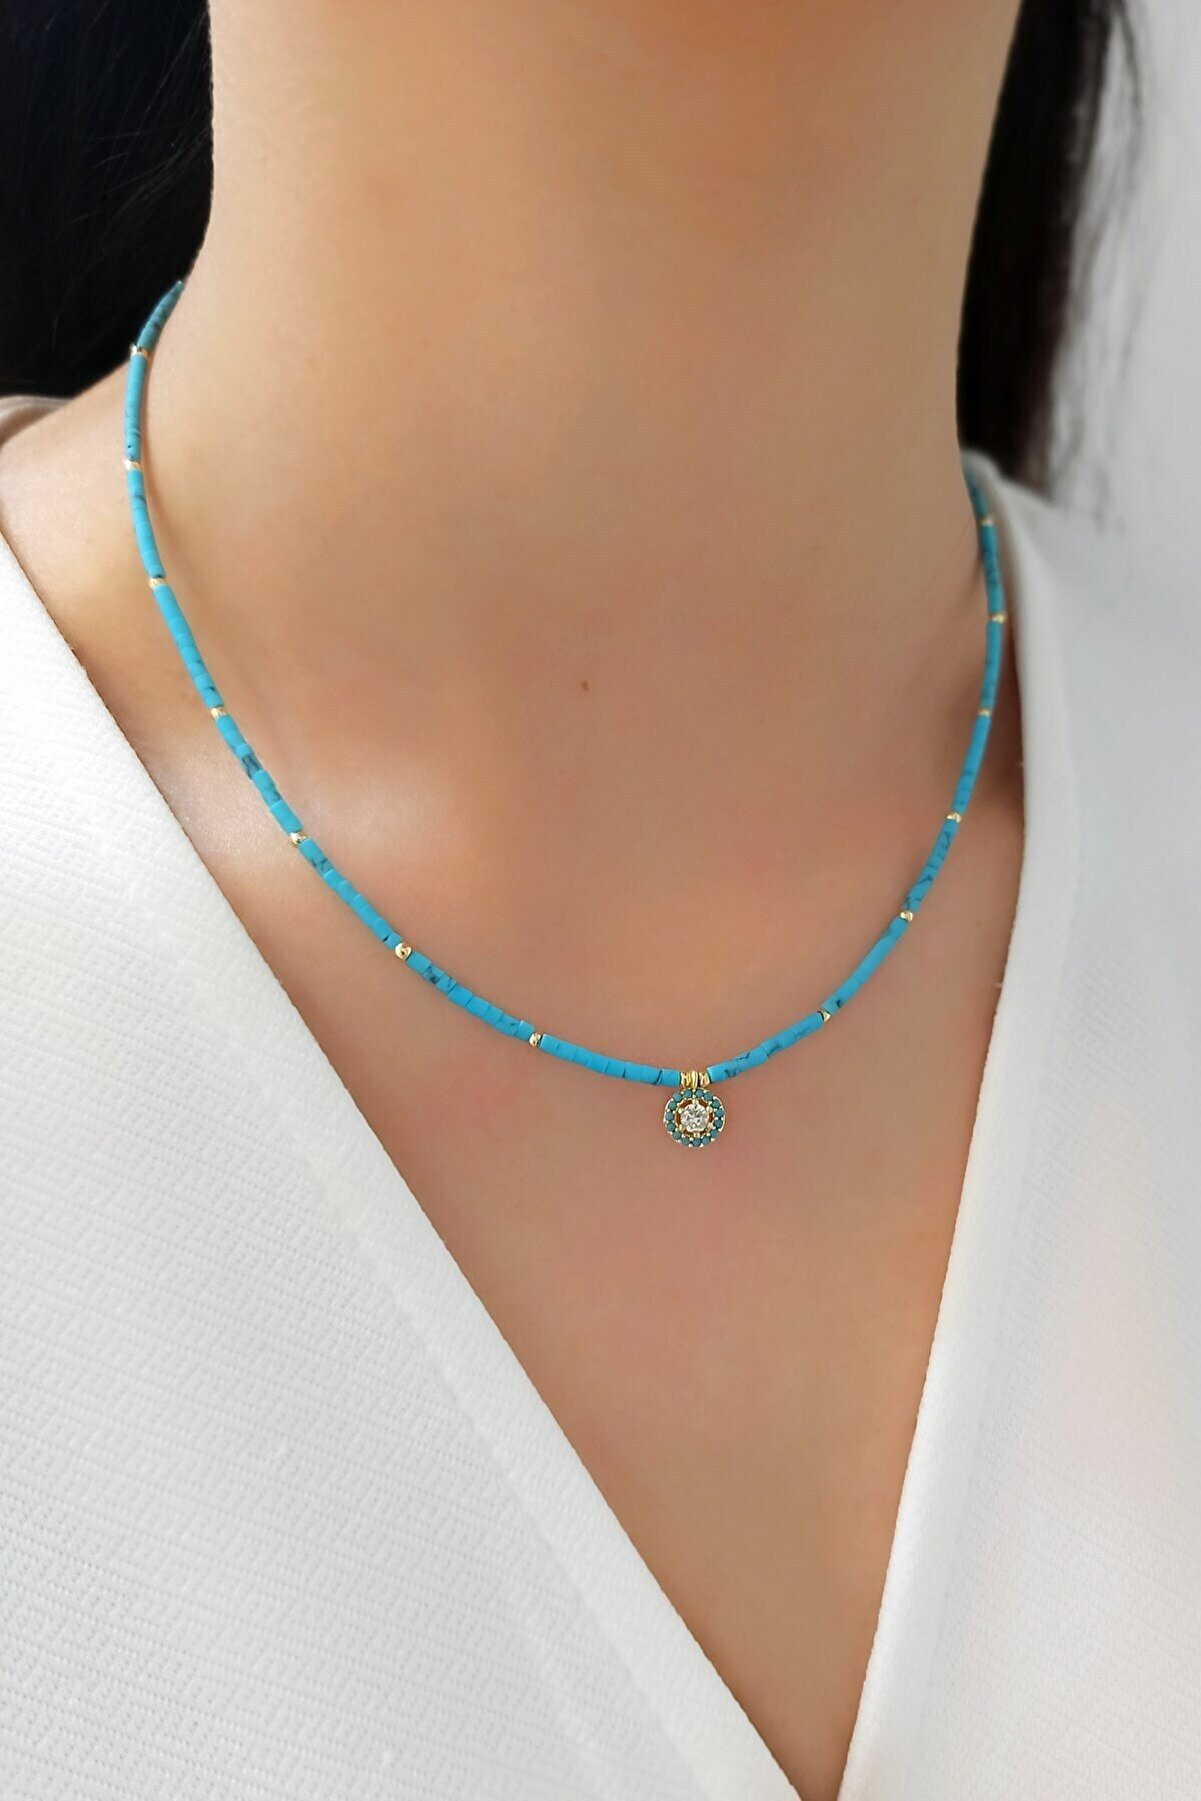 Çlk Accessories Boru Boncuk Mavi Taşlı Kolye Trkolye5509 B32003